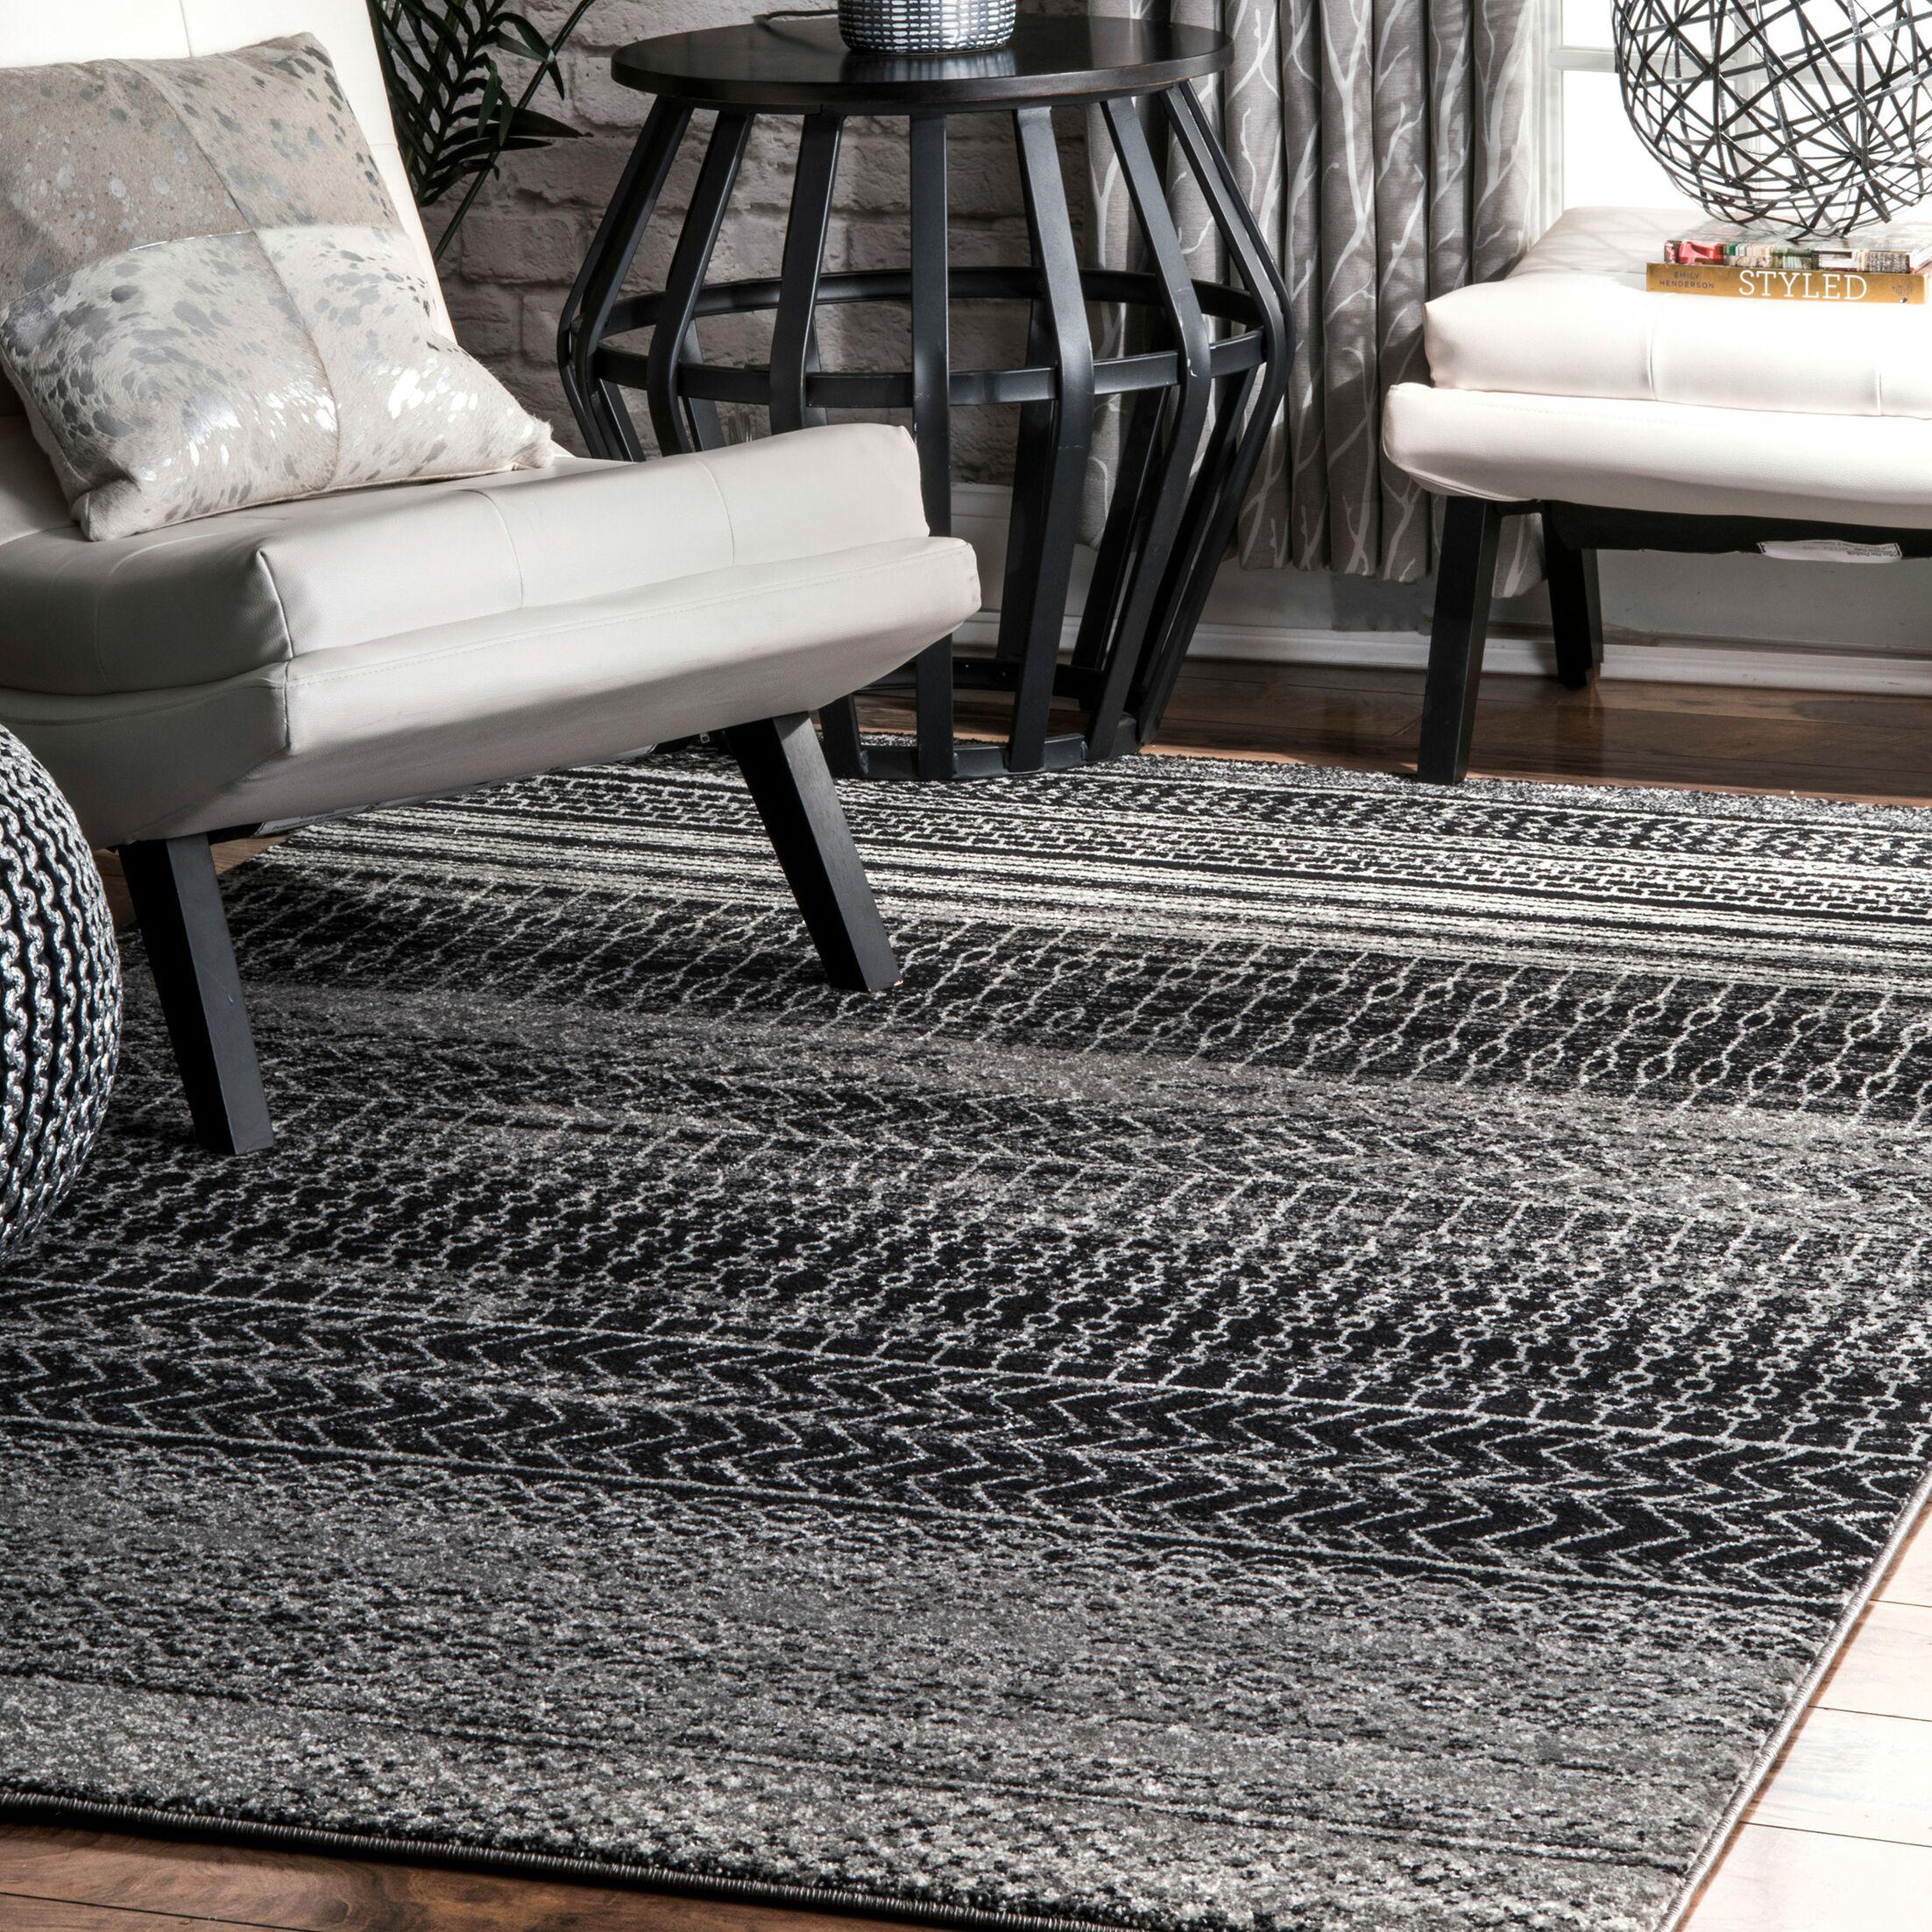 Patel Dark Gray Area Rug Rug Size: Rectangle 5' x 7'5